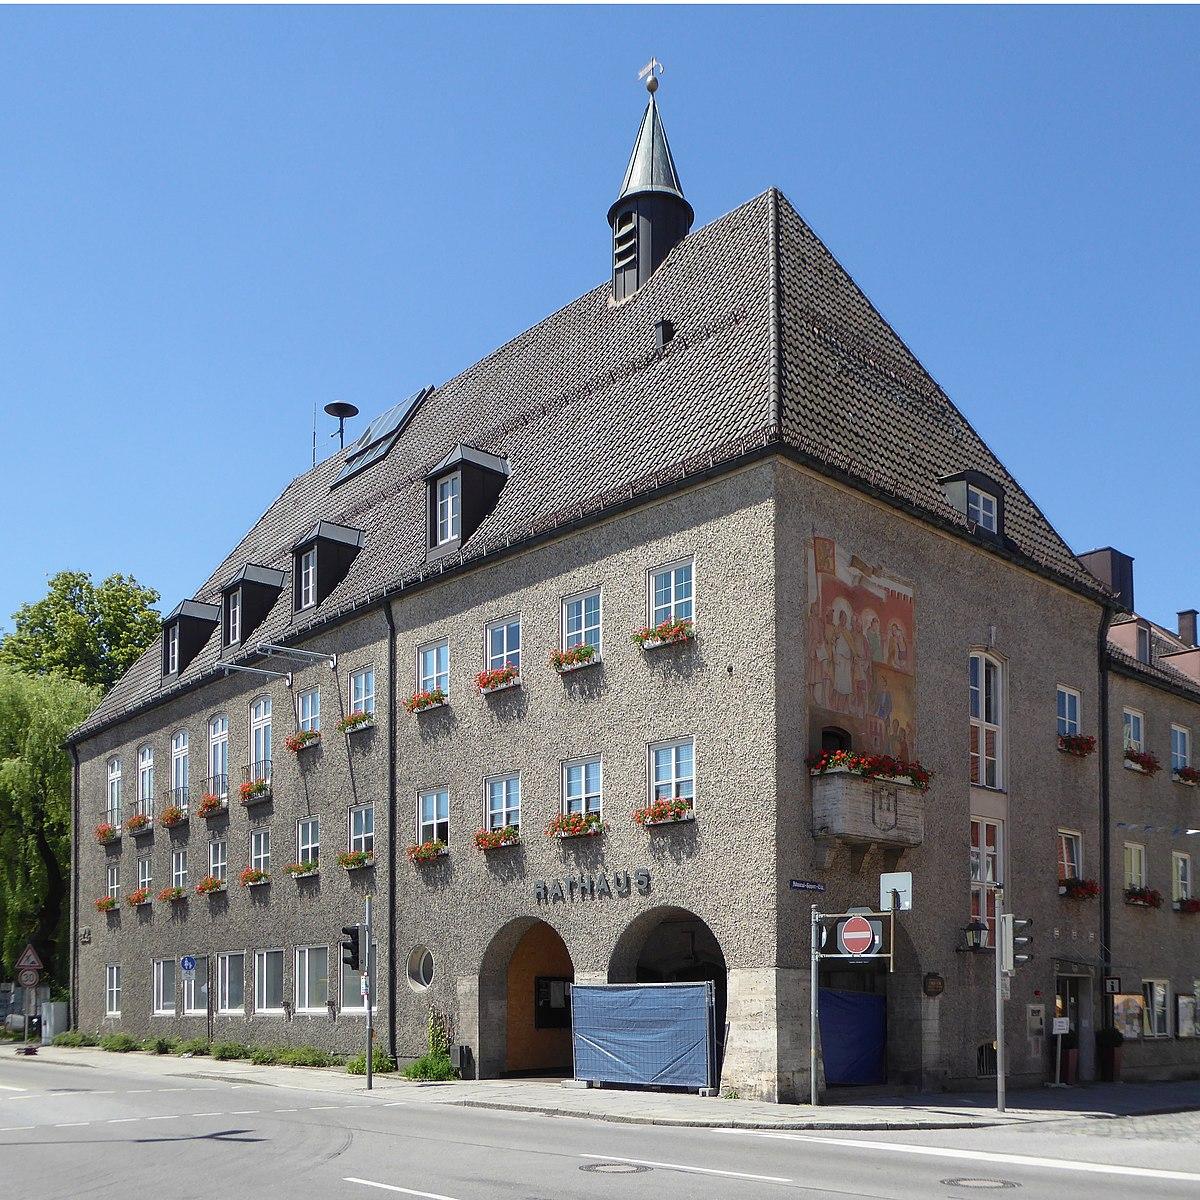 Wallfahrtsorte In Oberbayern